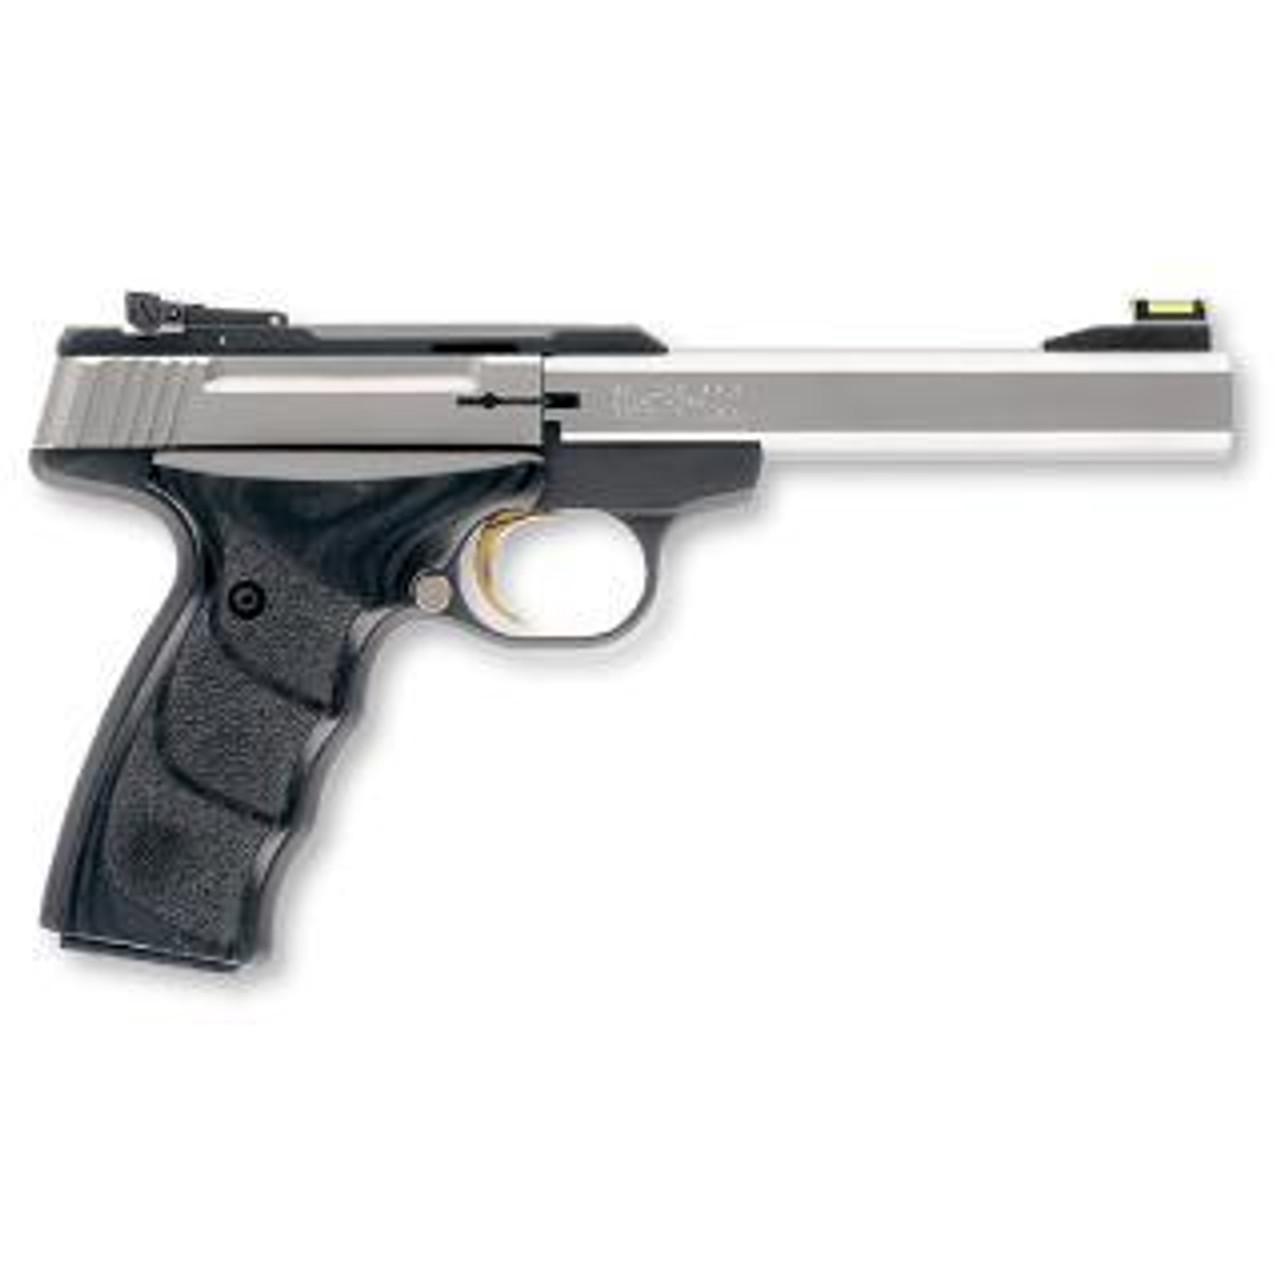 Browning Buckmark Plus CALIFORNIA LEGAL - .22LR